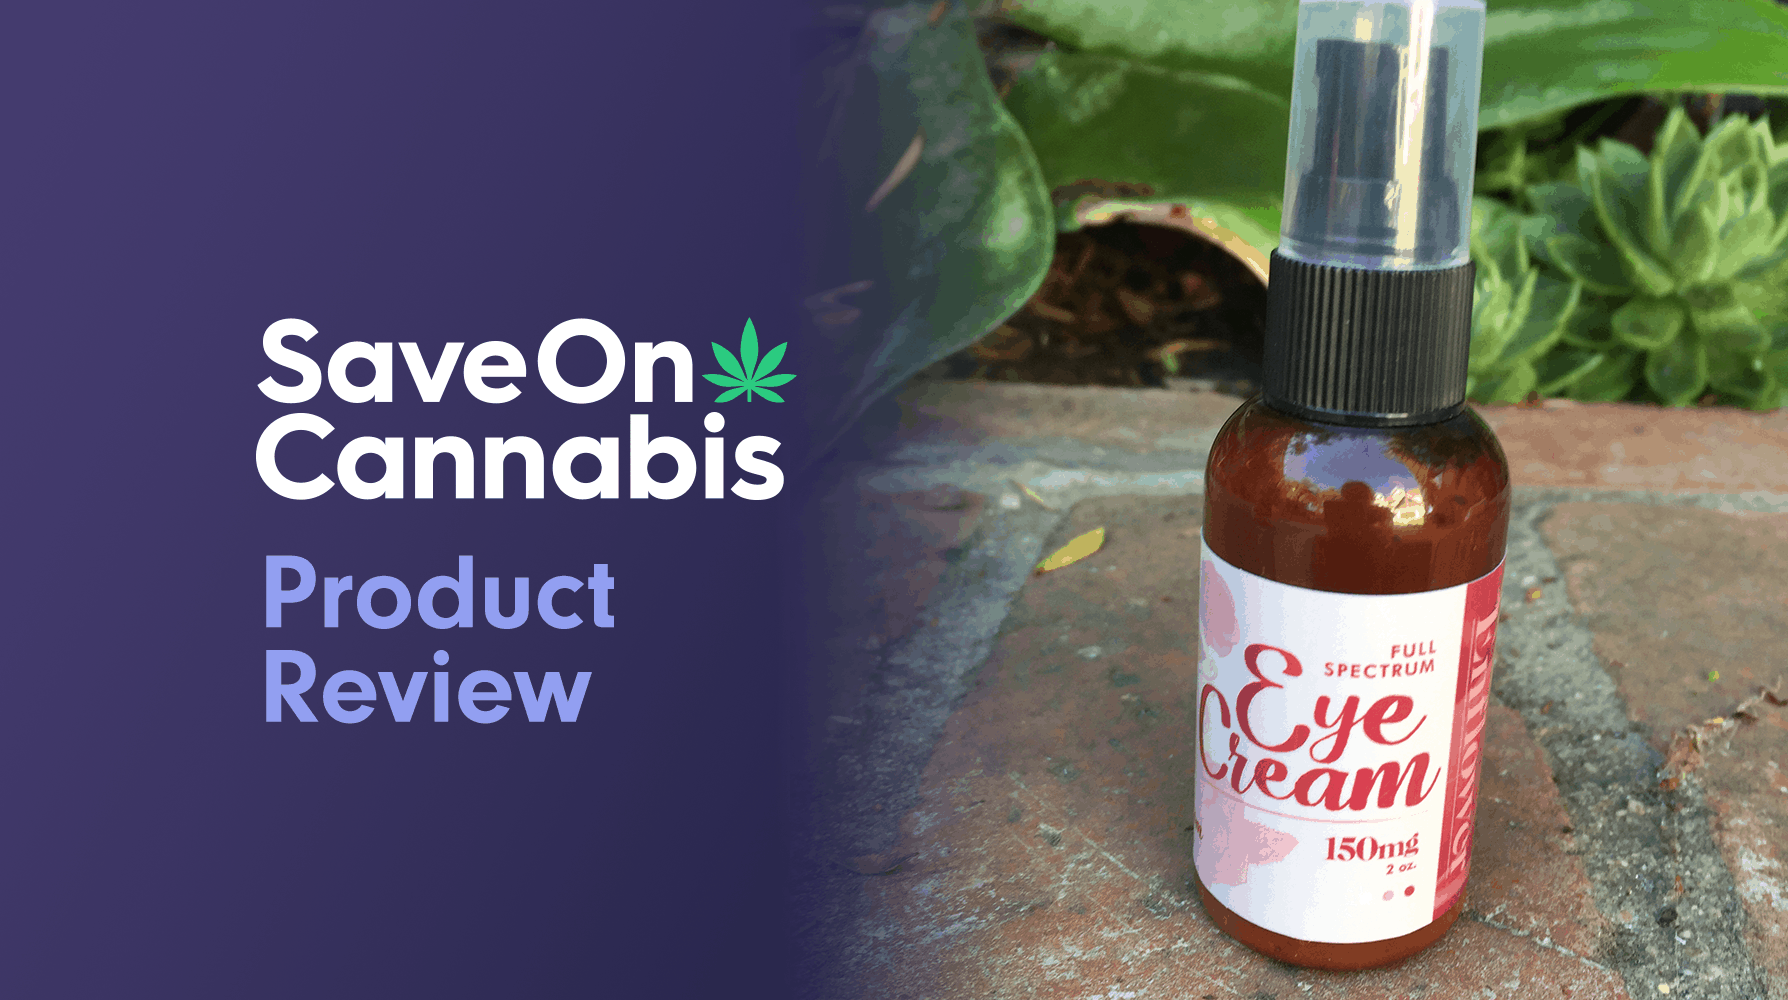 Enflower CBD eye cream Extract CBD review save on cannabis website